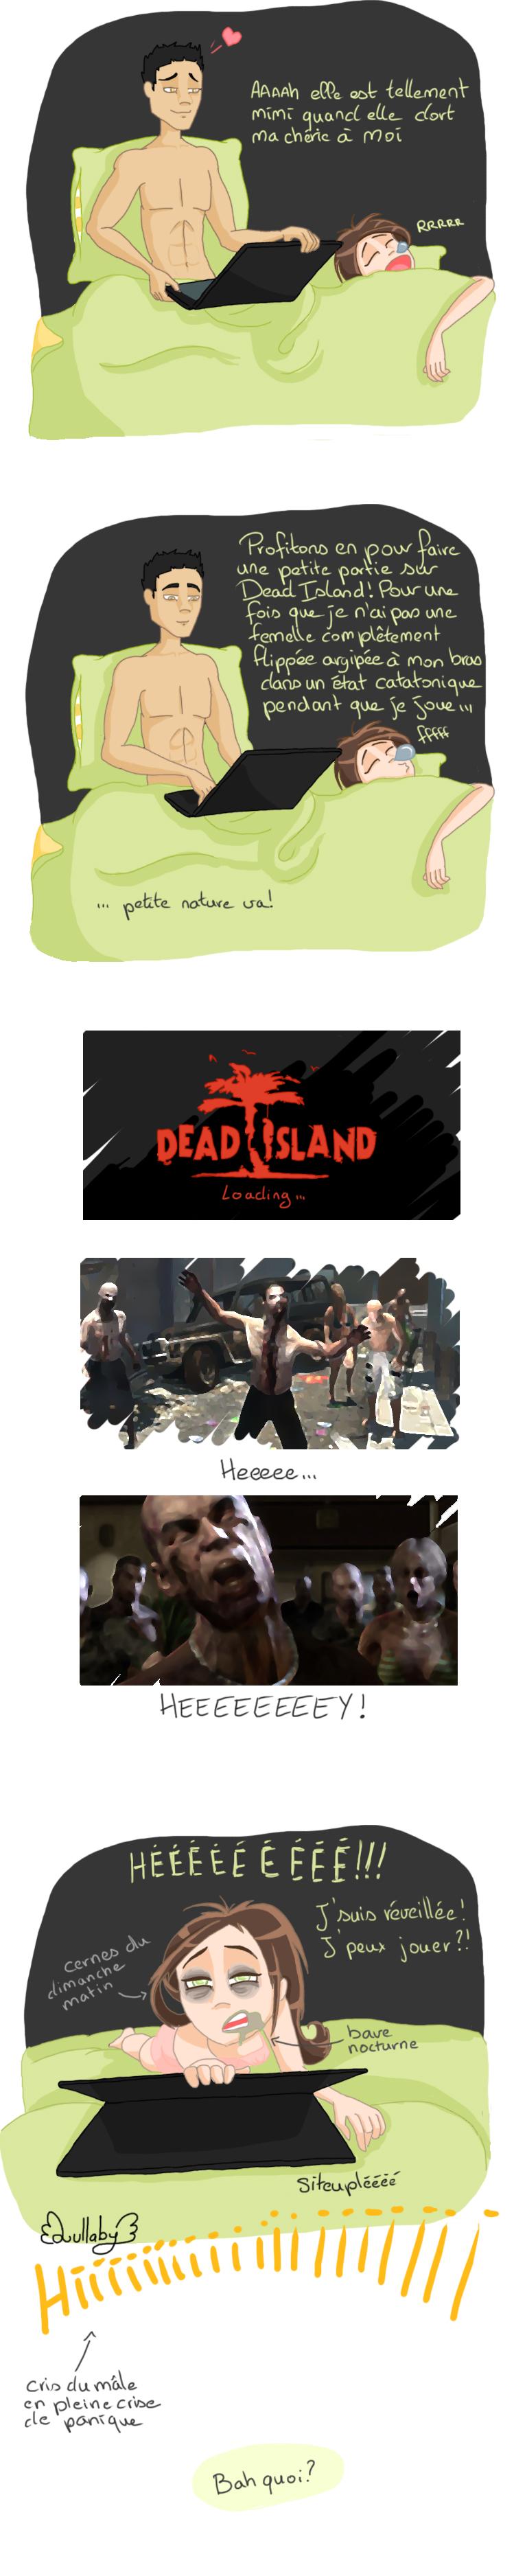 dead island copie